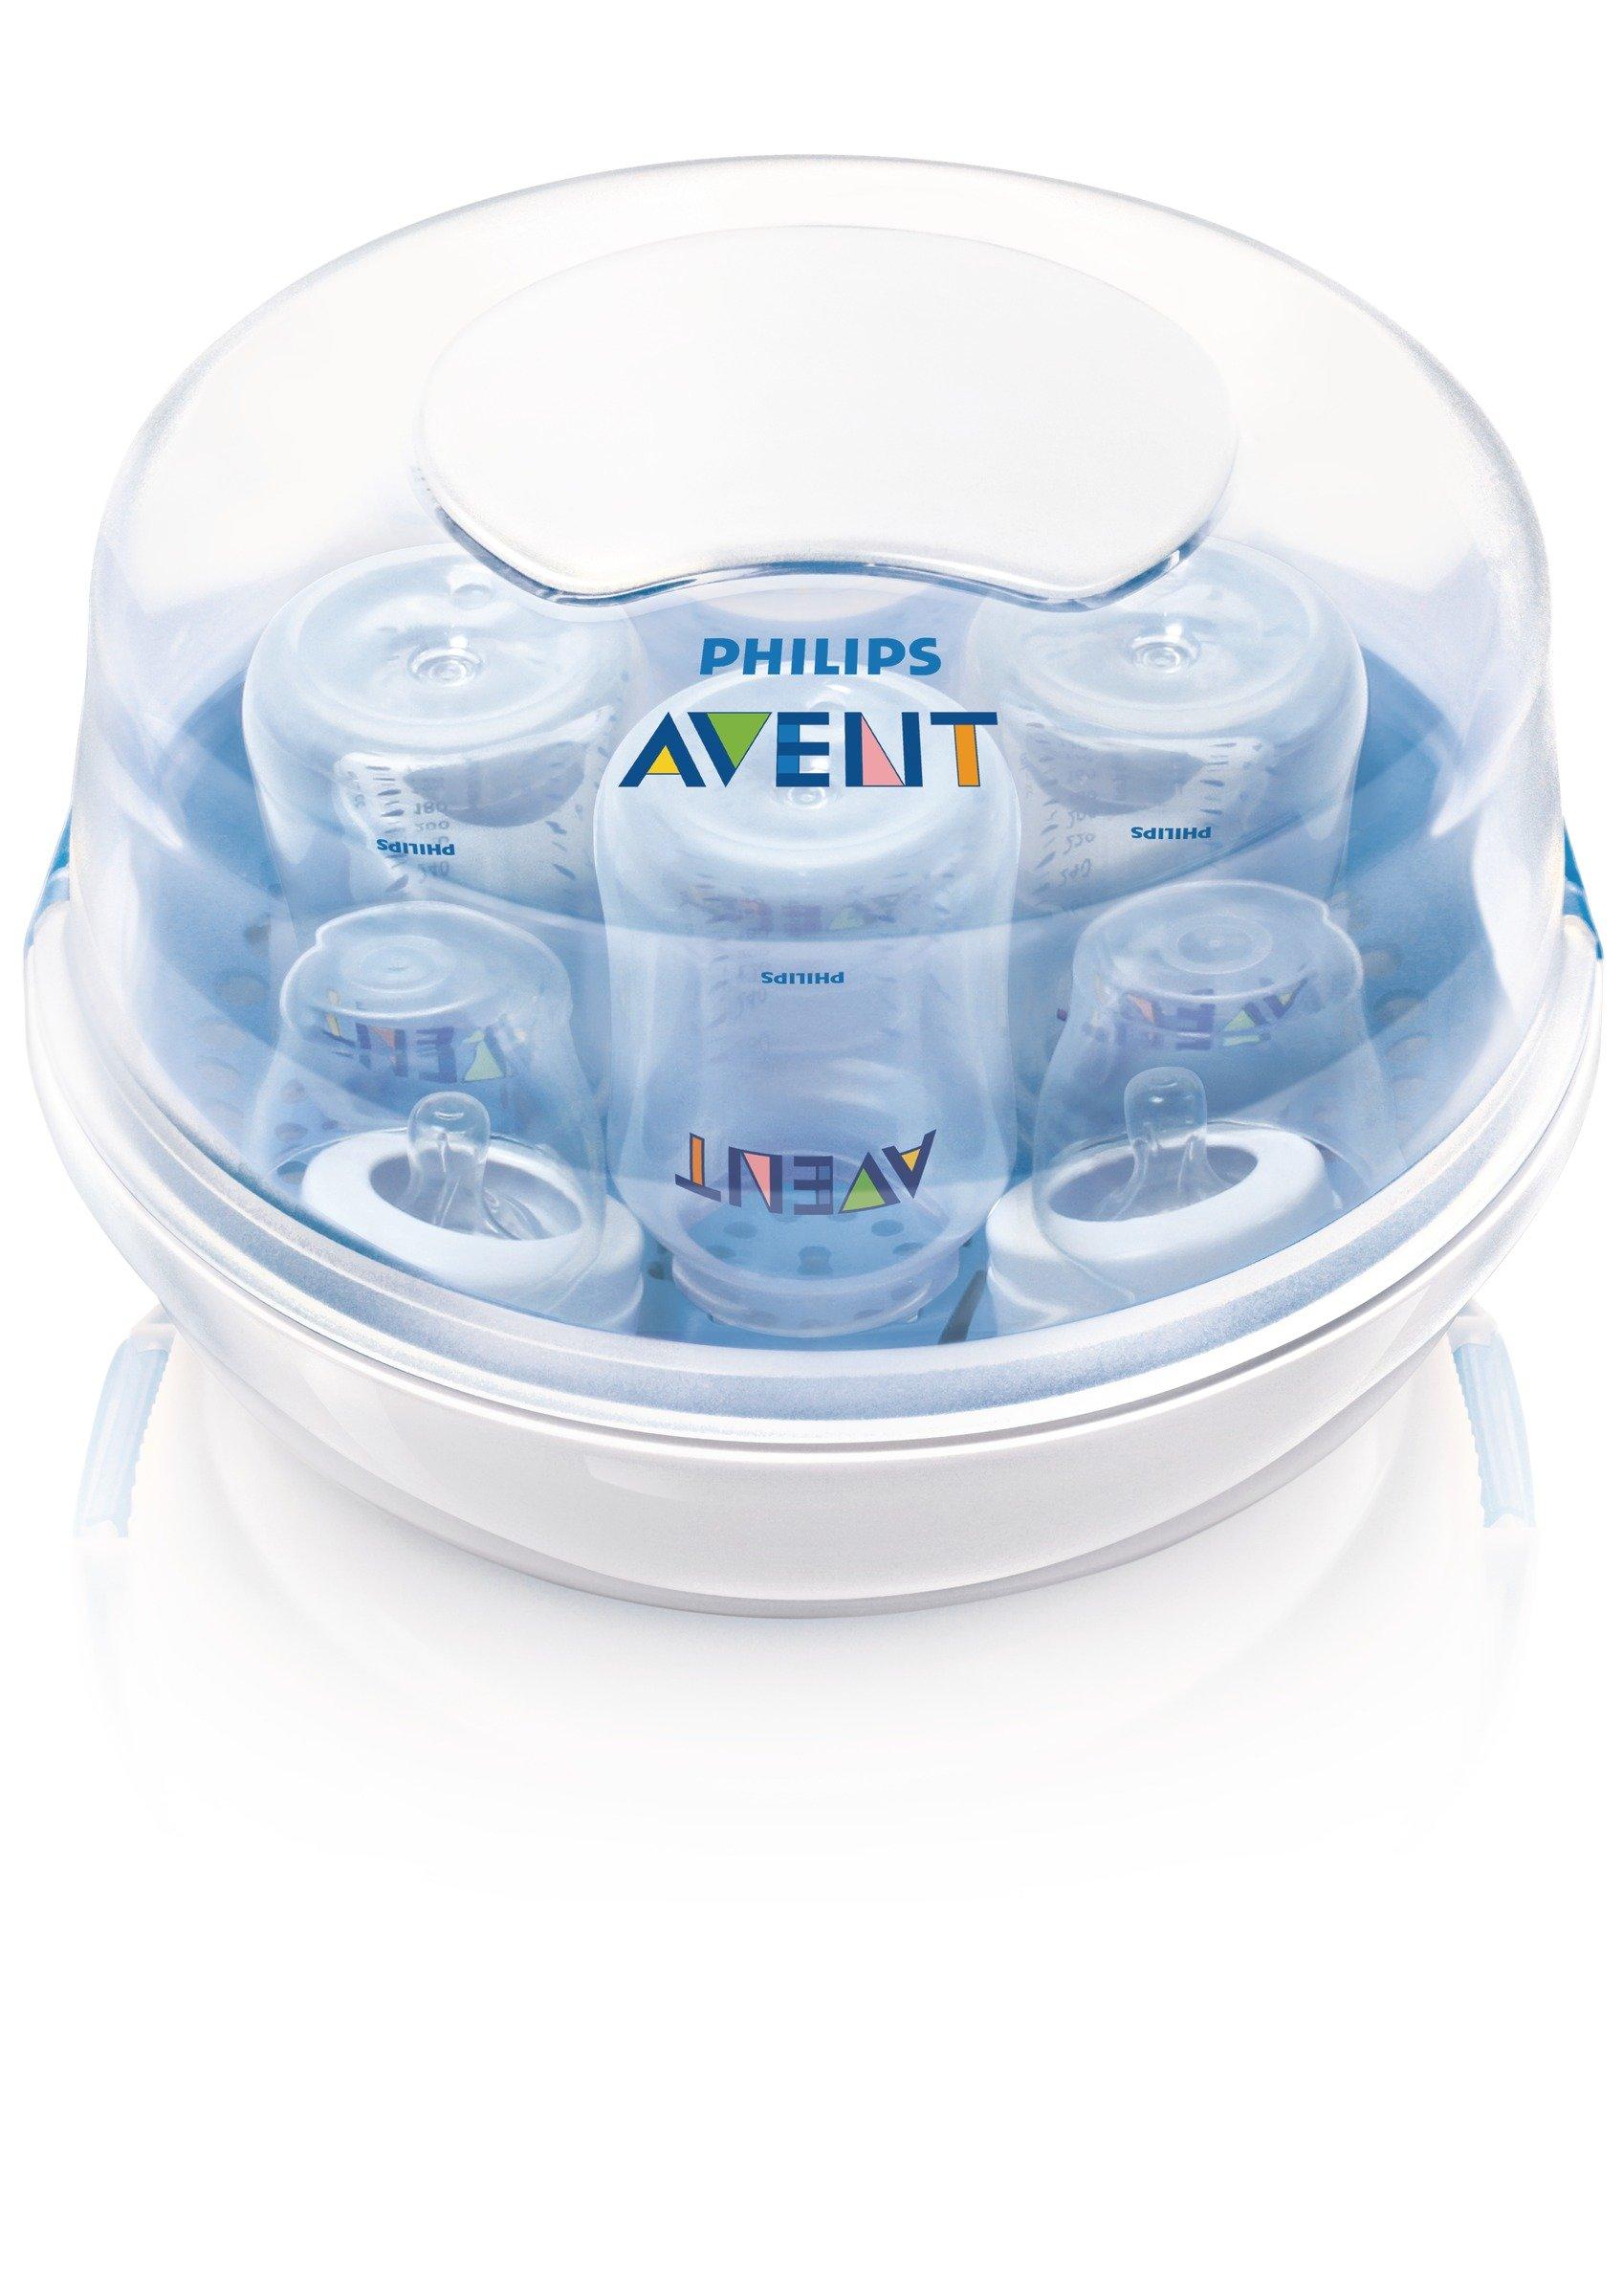 Philips AVENT Microwave Steam Sterilizer